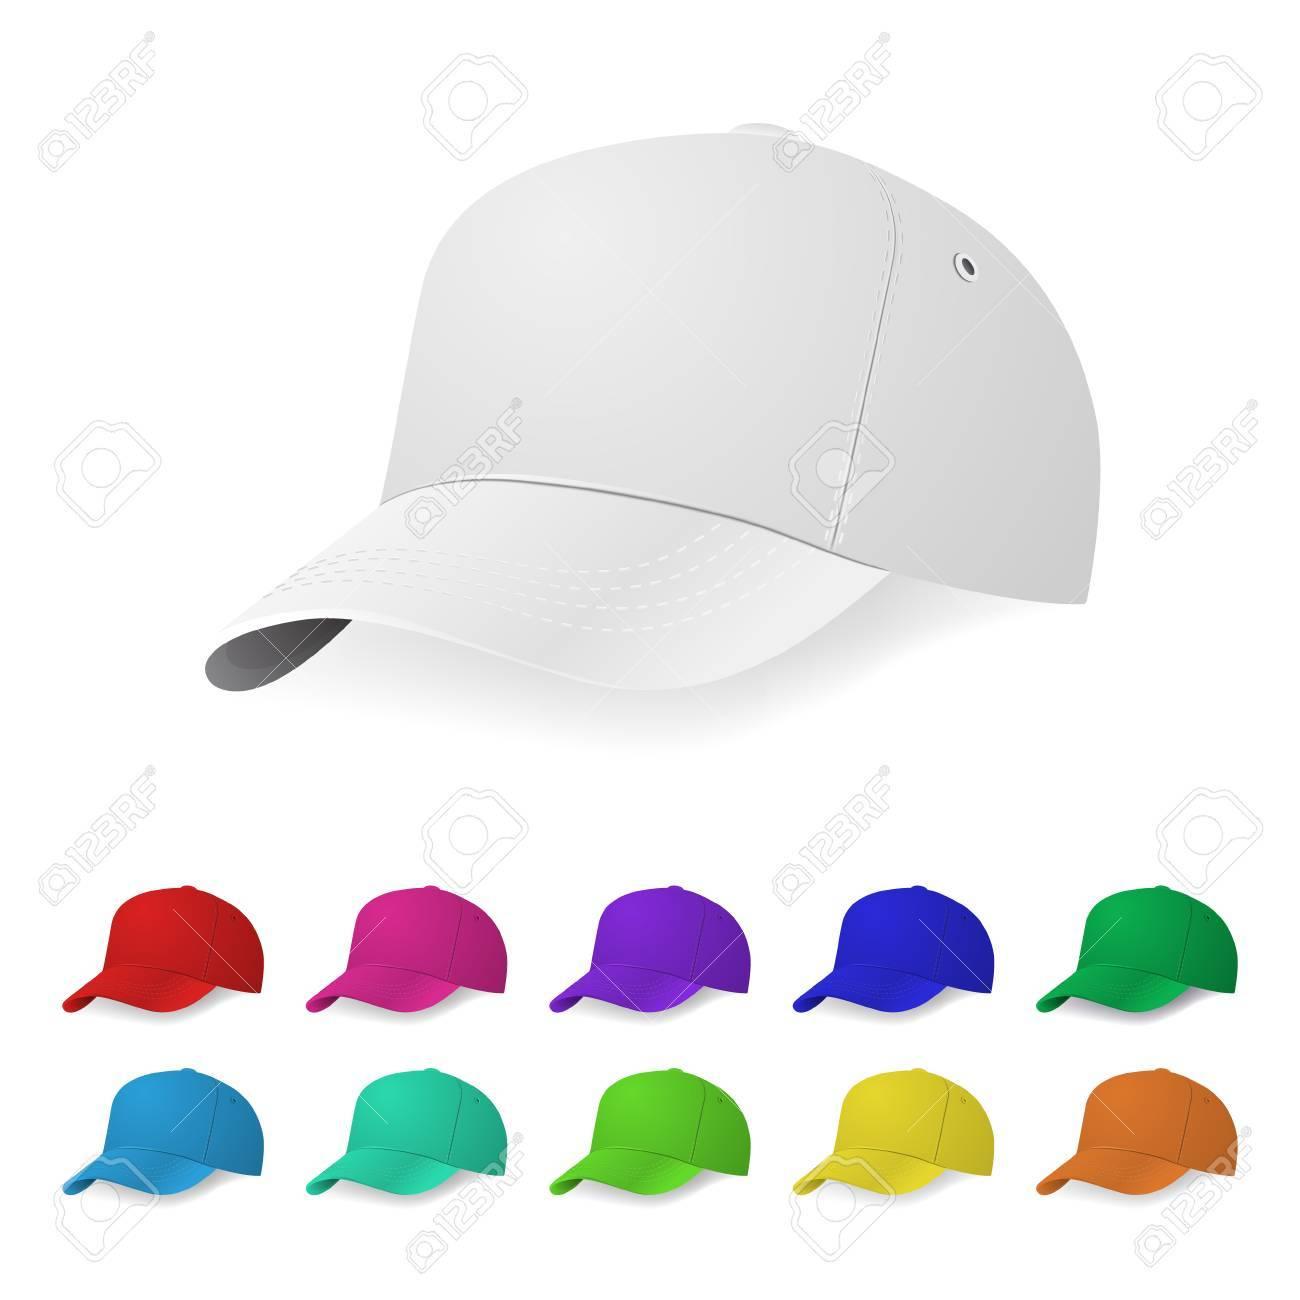 Set Of Realistic Baseball Cap Templates. Royalty Free Cliparts ...